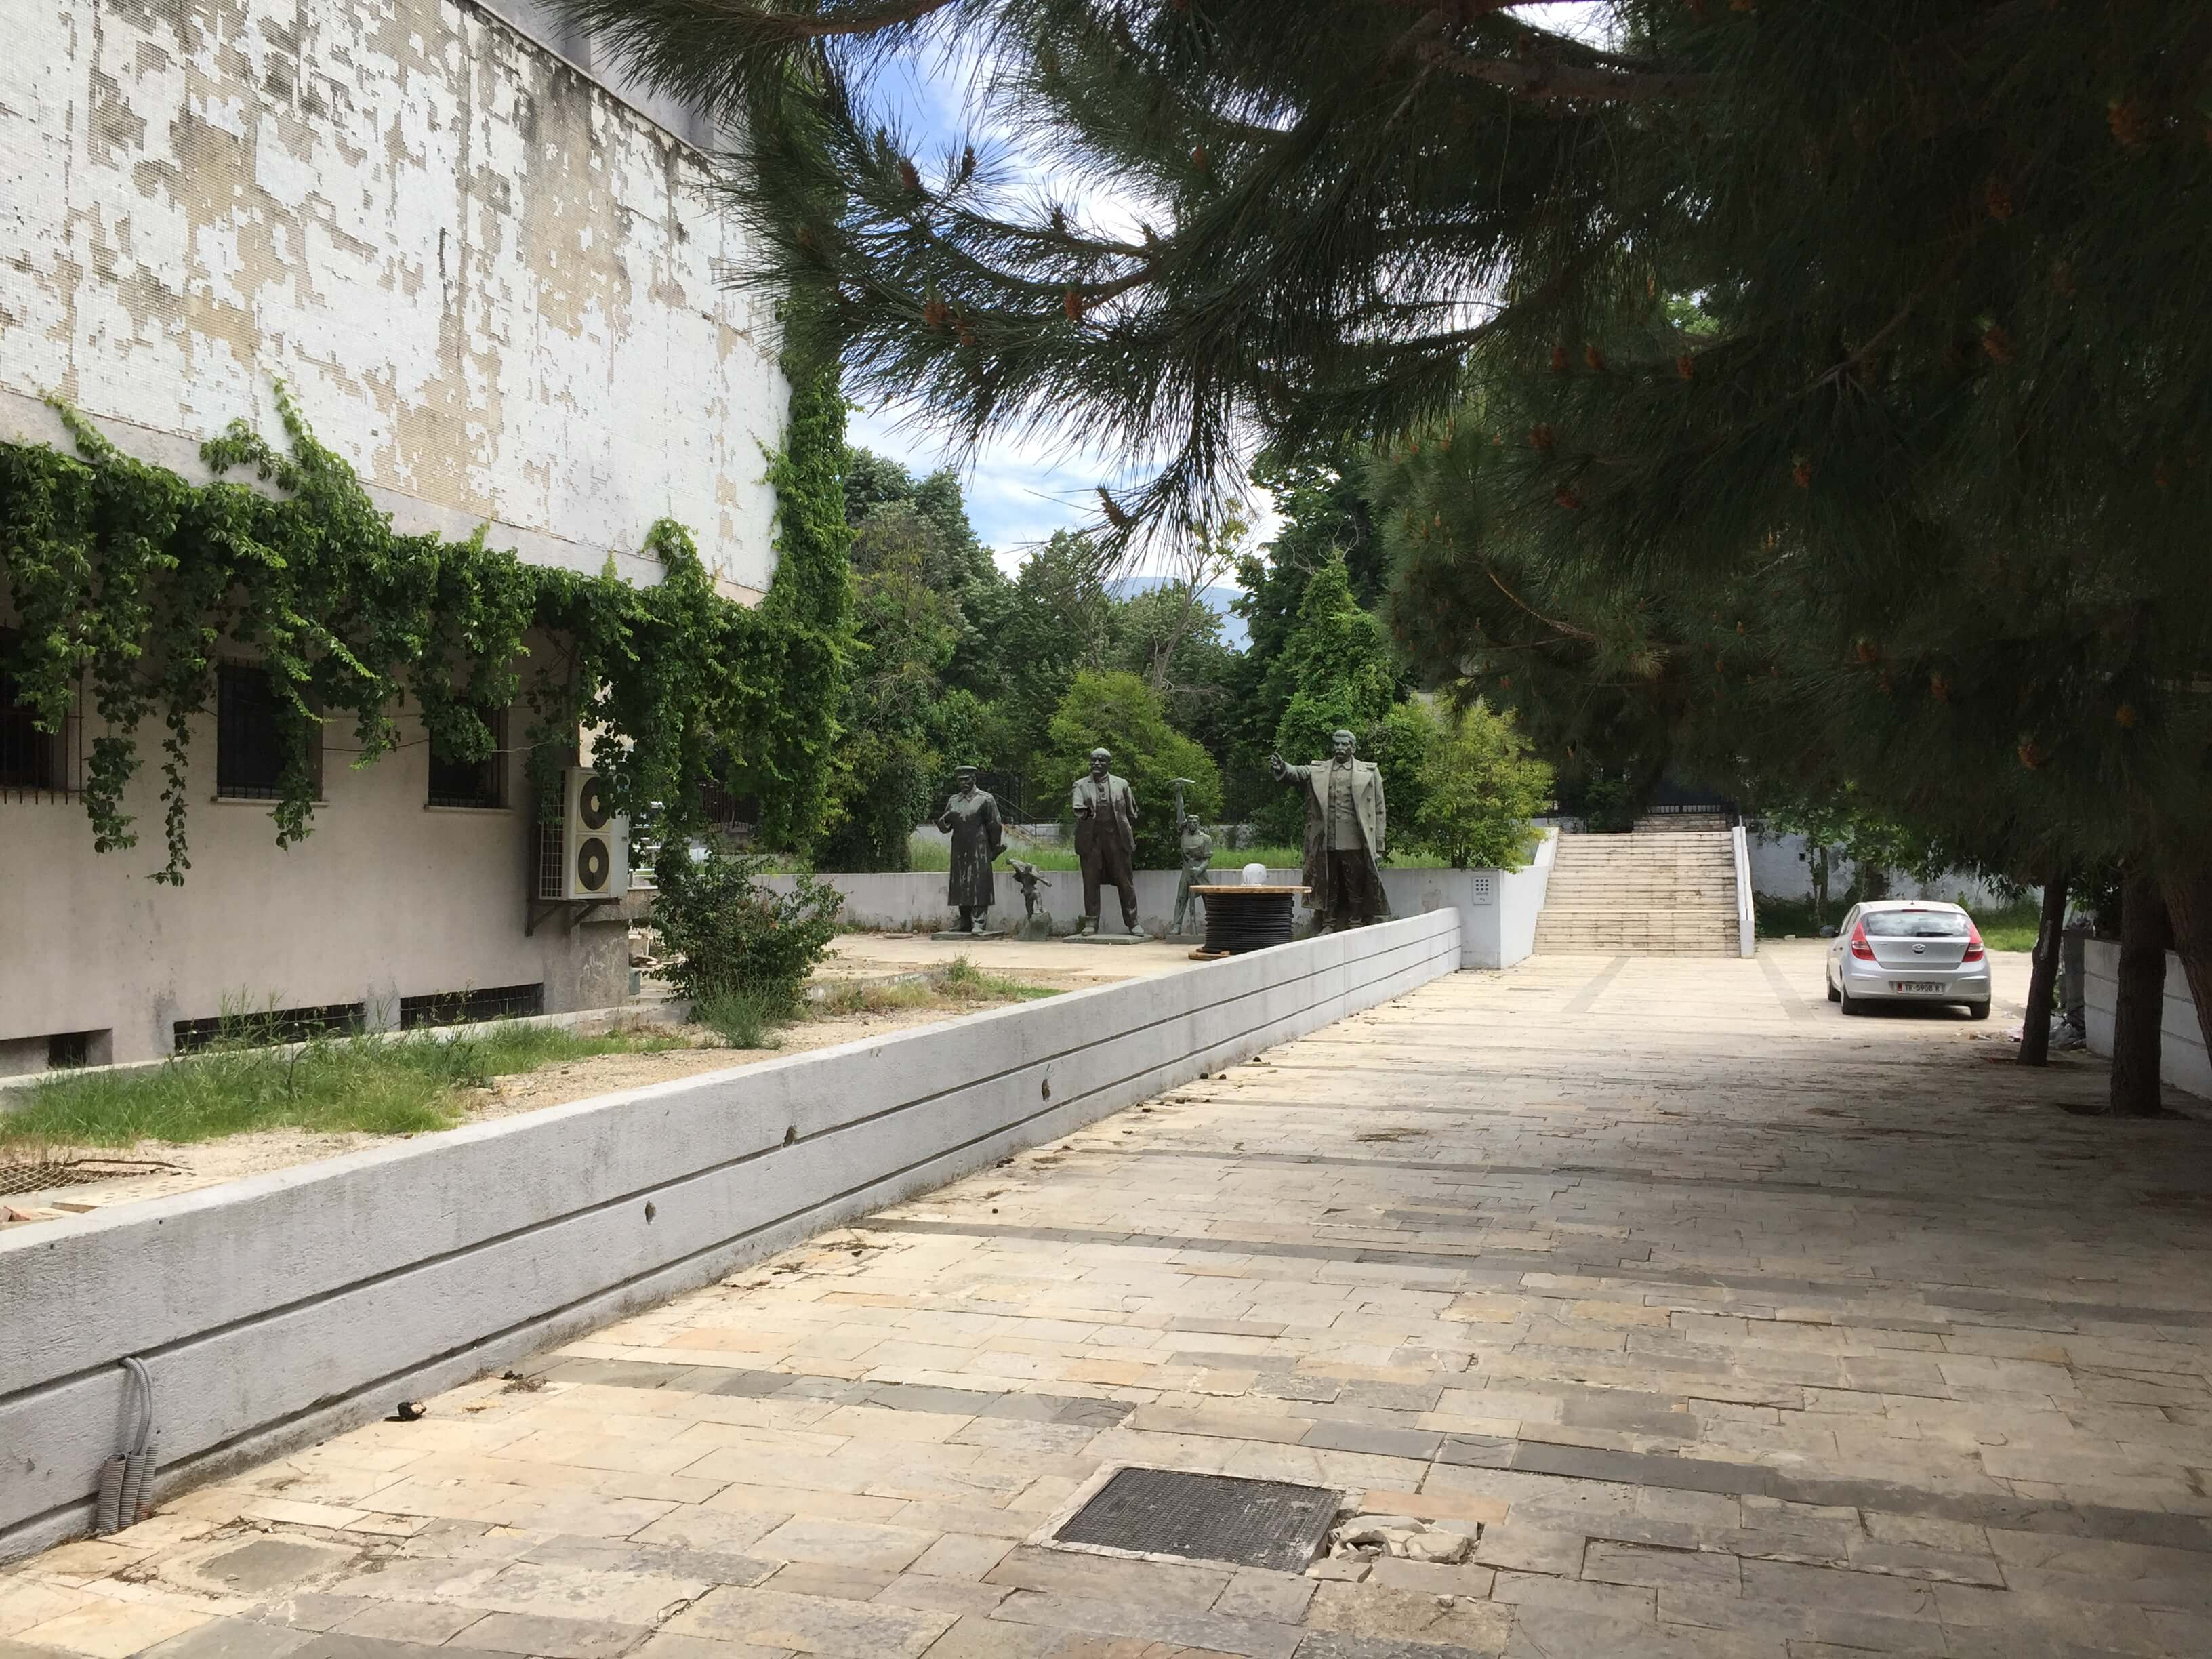 Abandoned Communist Statues in Tirana, Albania